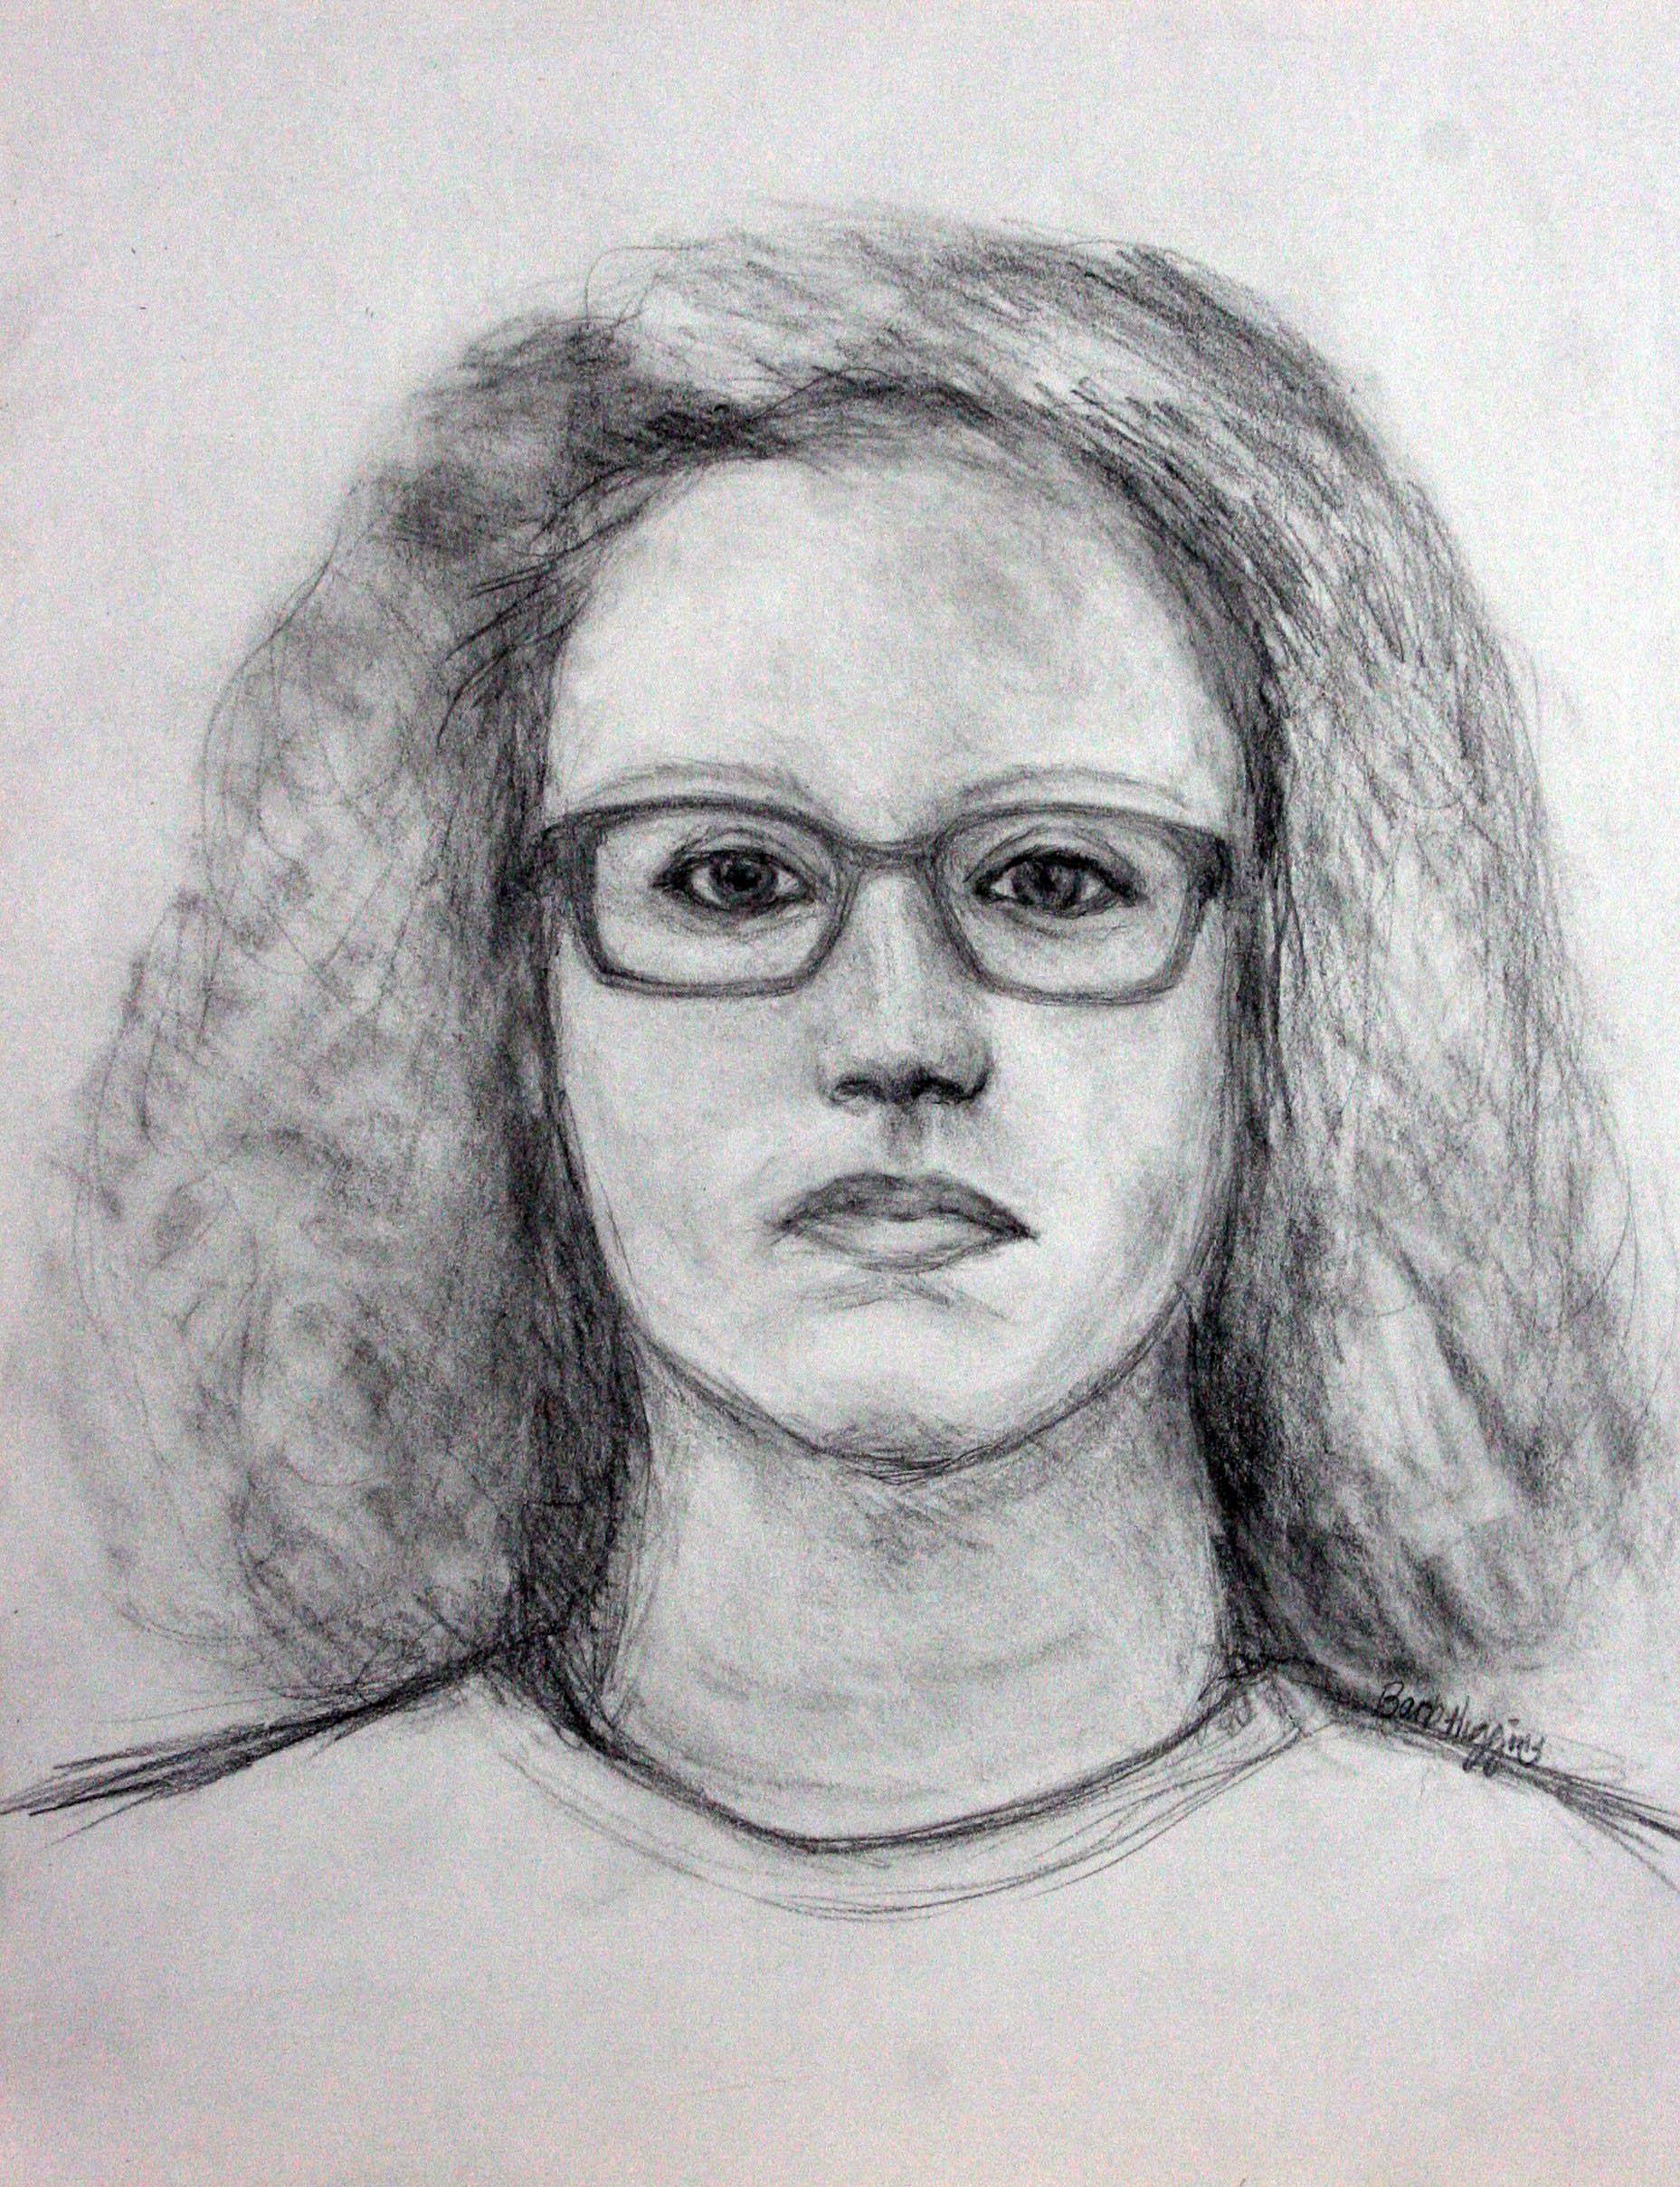 Barbara Higgins did this drawing.